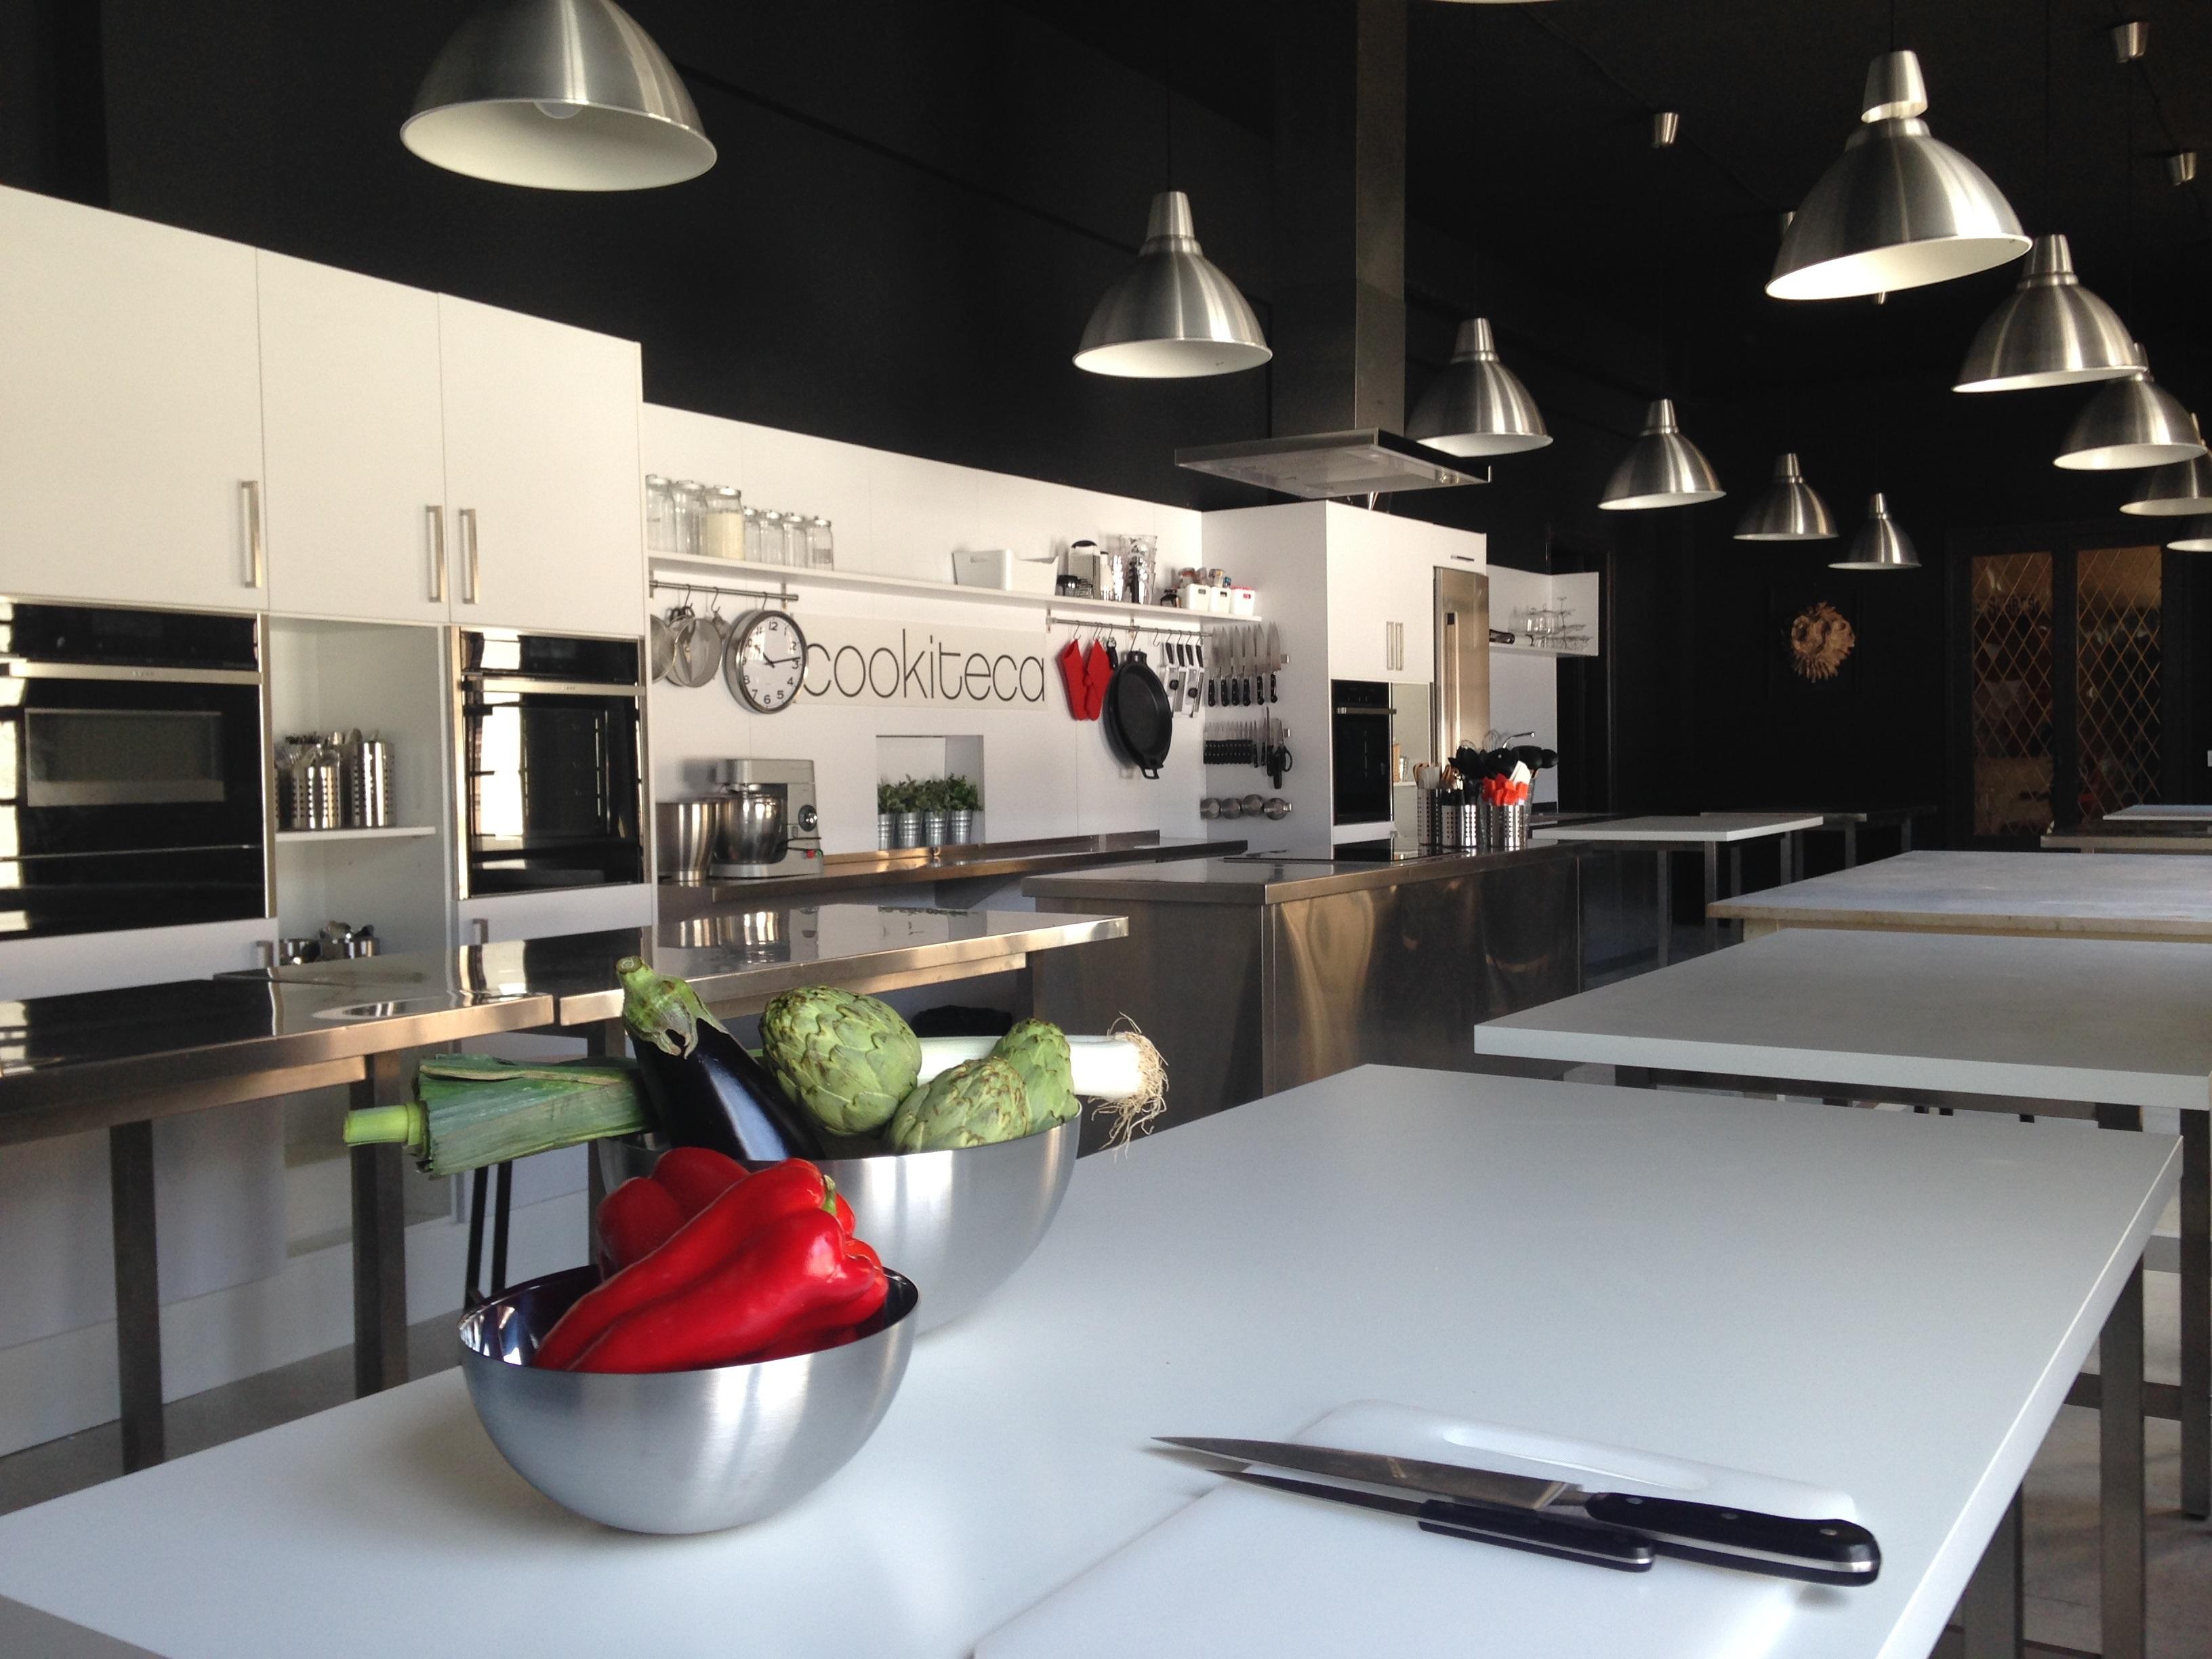 Alquiler de espacios cookiteca - Menaje cocina barcelona ...